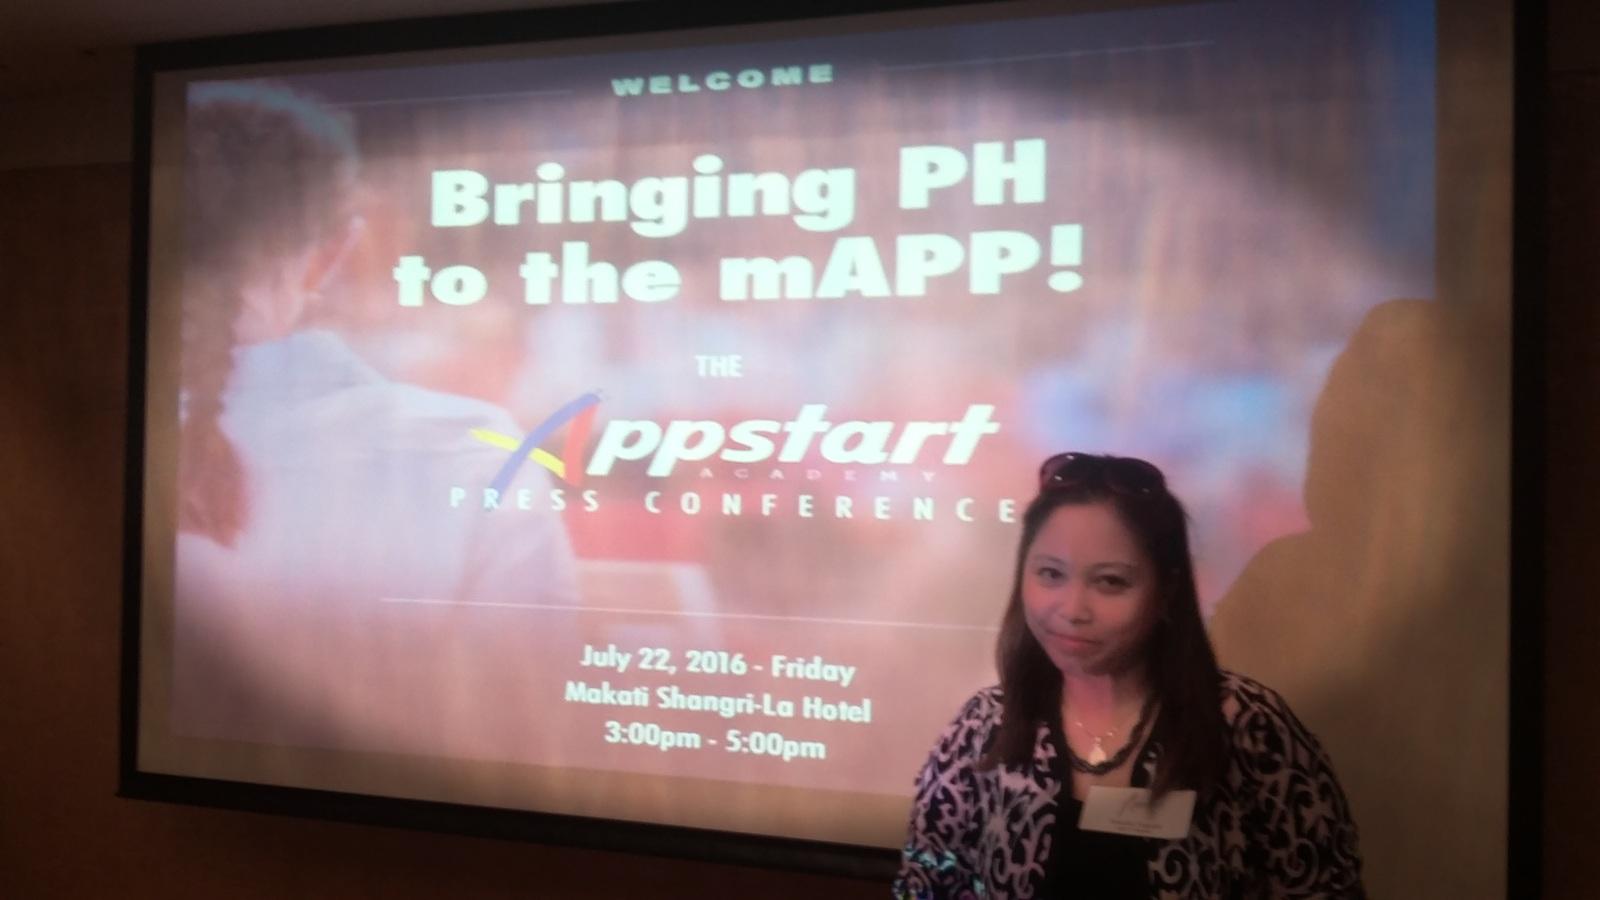 Seraphimsnotes blogspot com: Appstart Academy: Teaching Filipino's